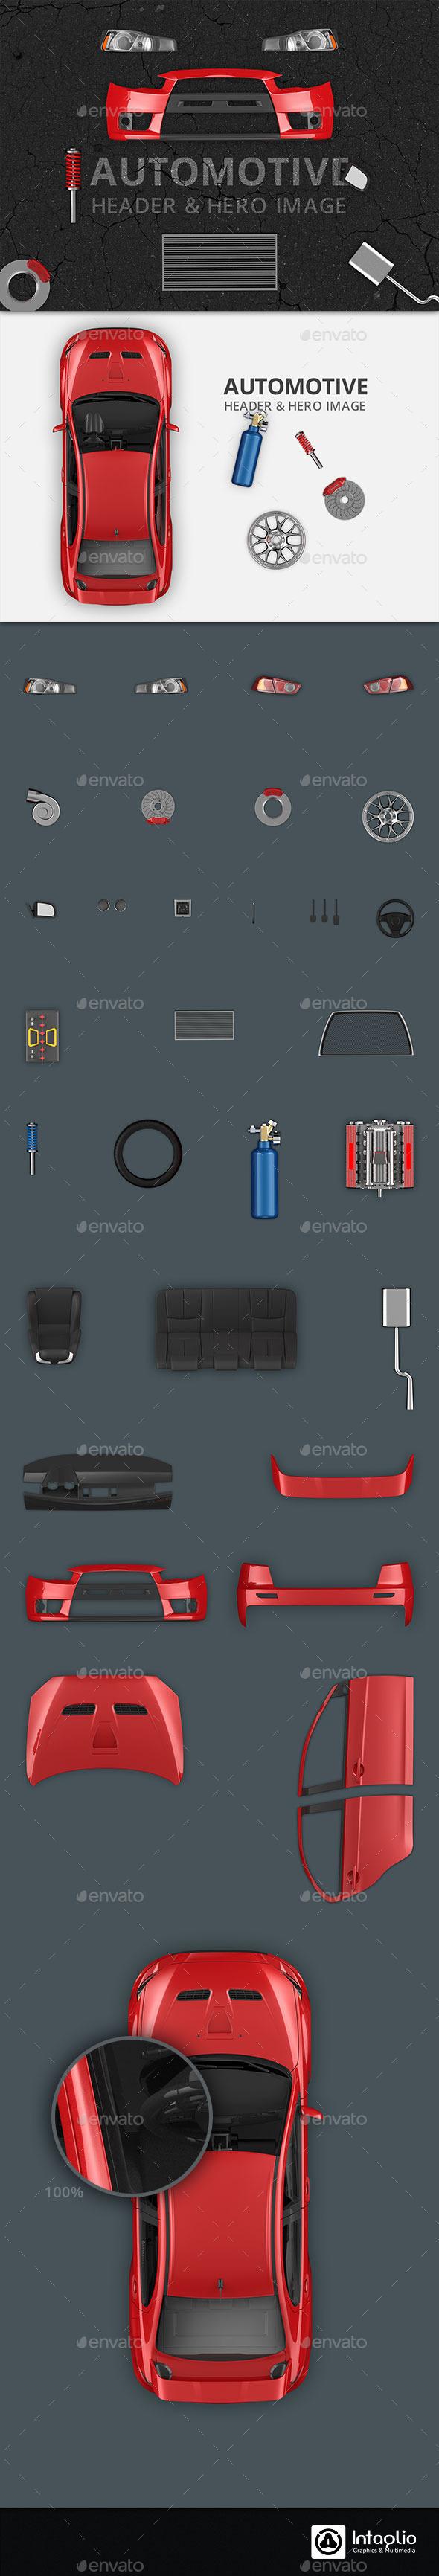 Automotive Hero Image and Header Mockup - Hero Images Graphics